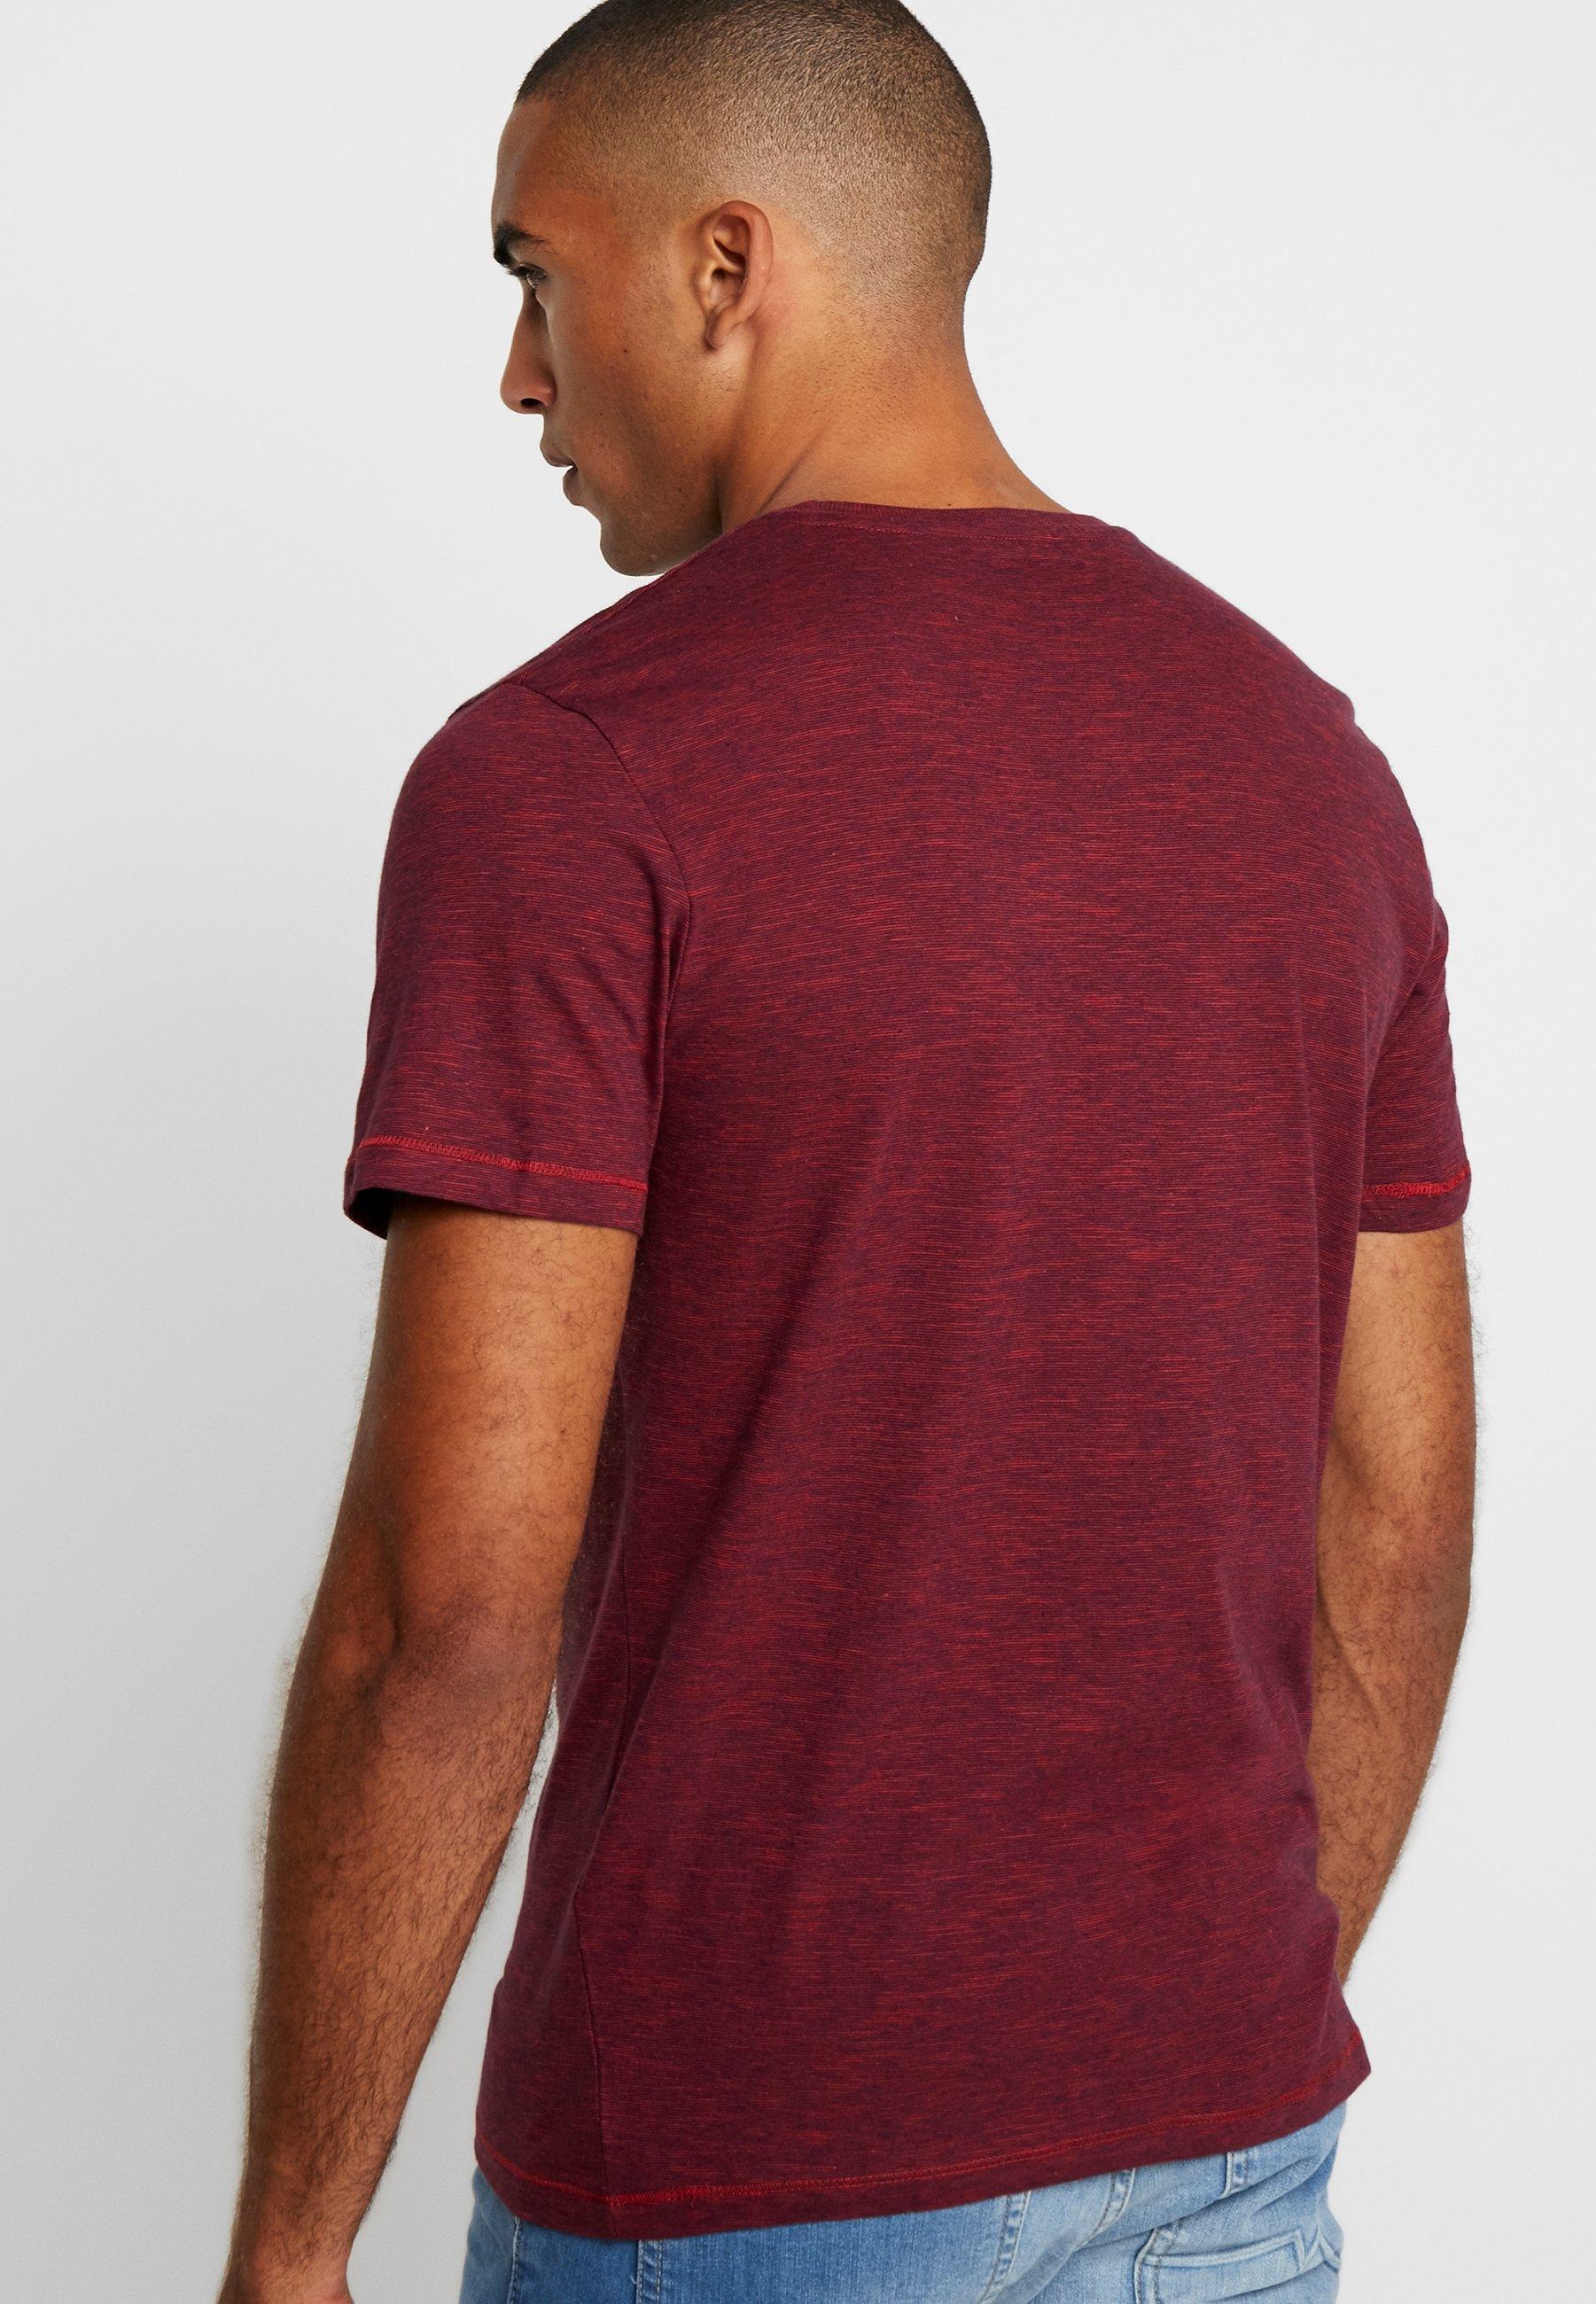 TOM TAILOR Print T-shirt - red/navy Vo7xQ